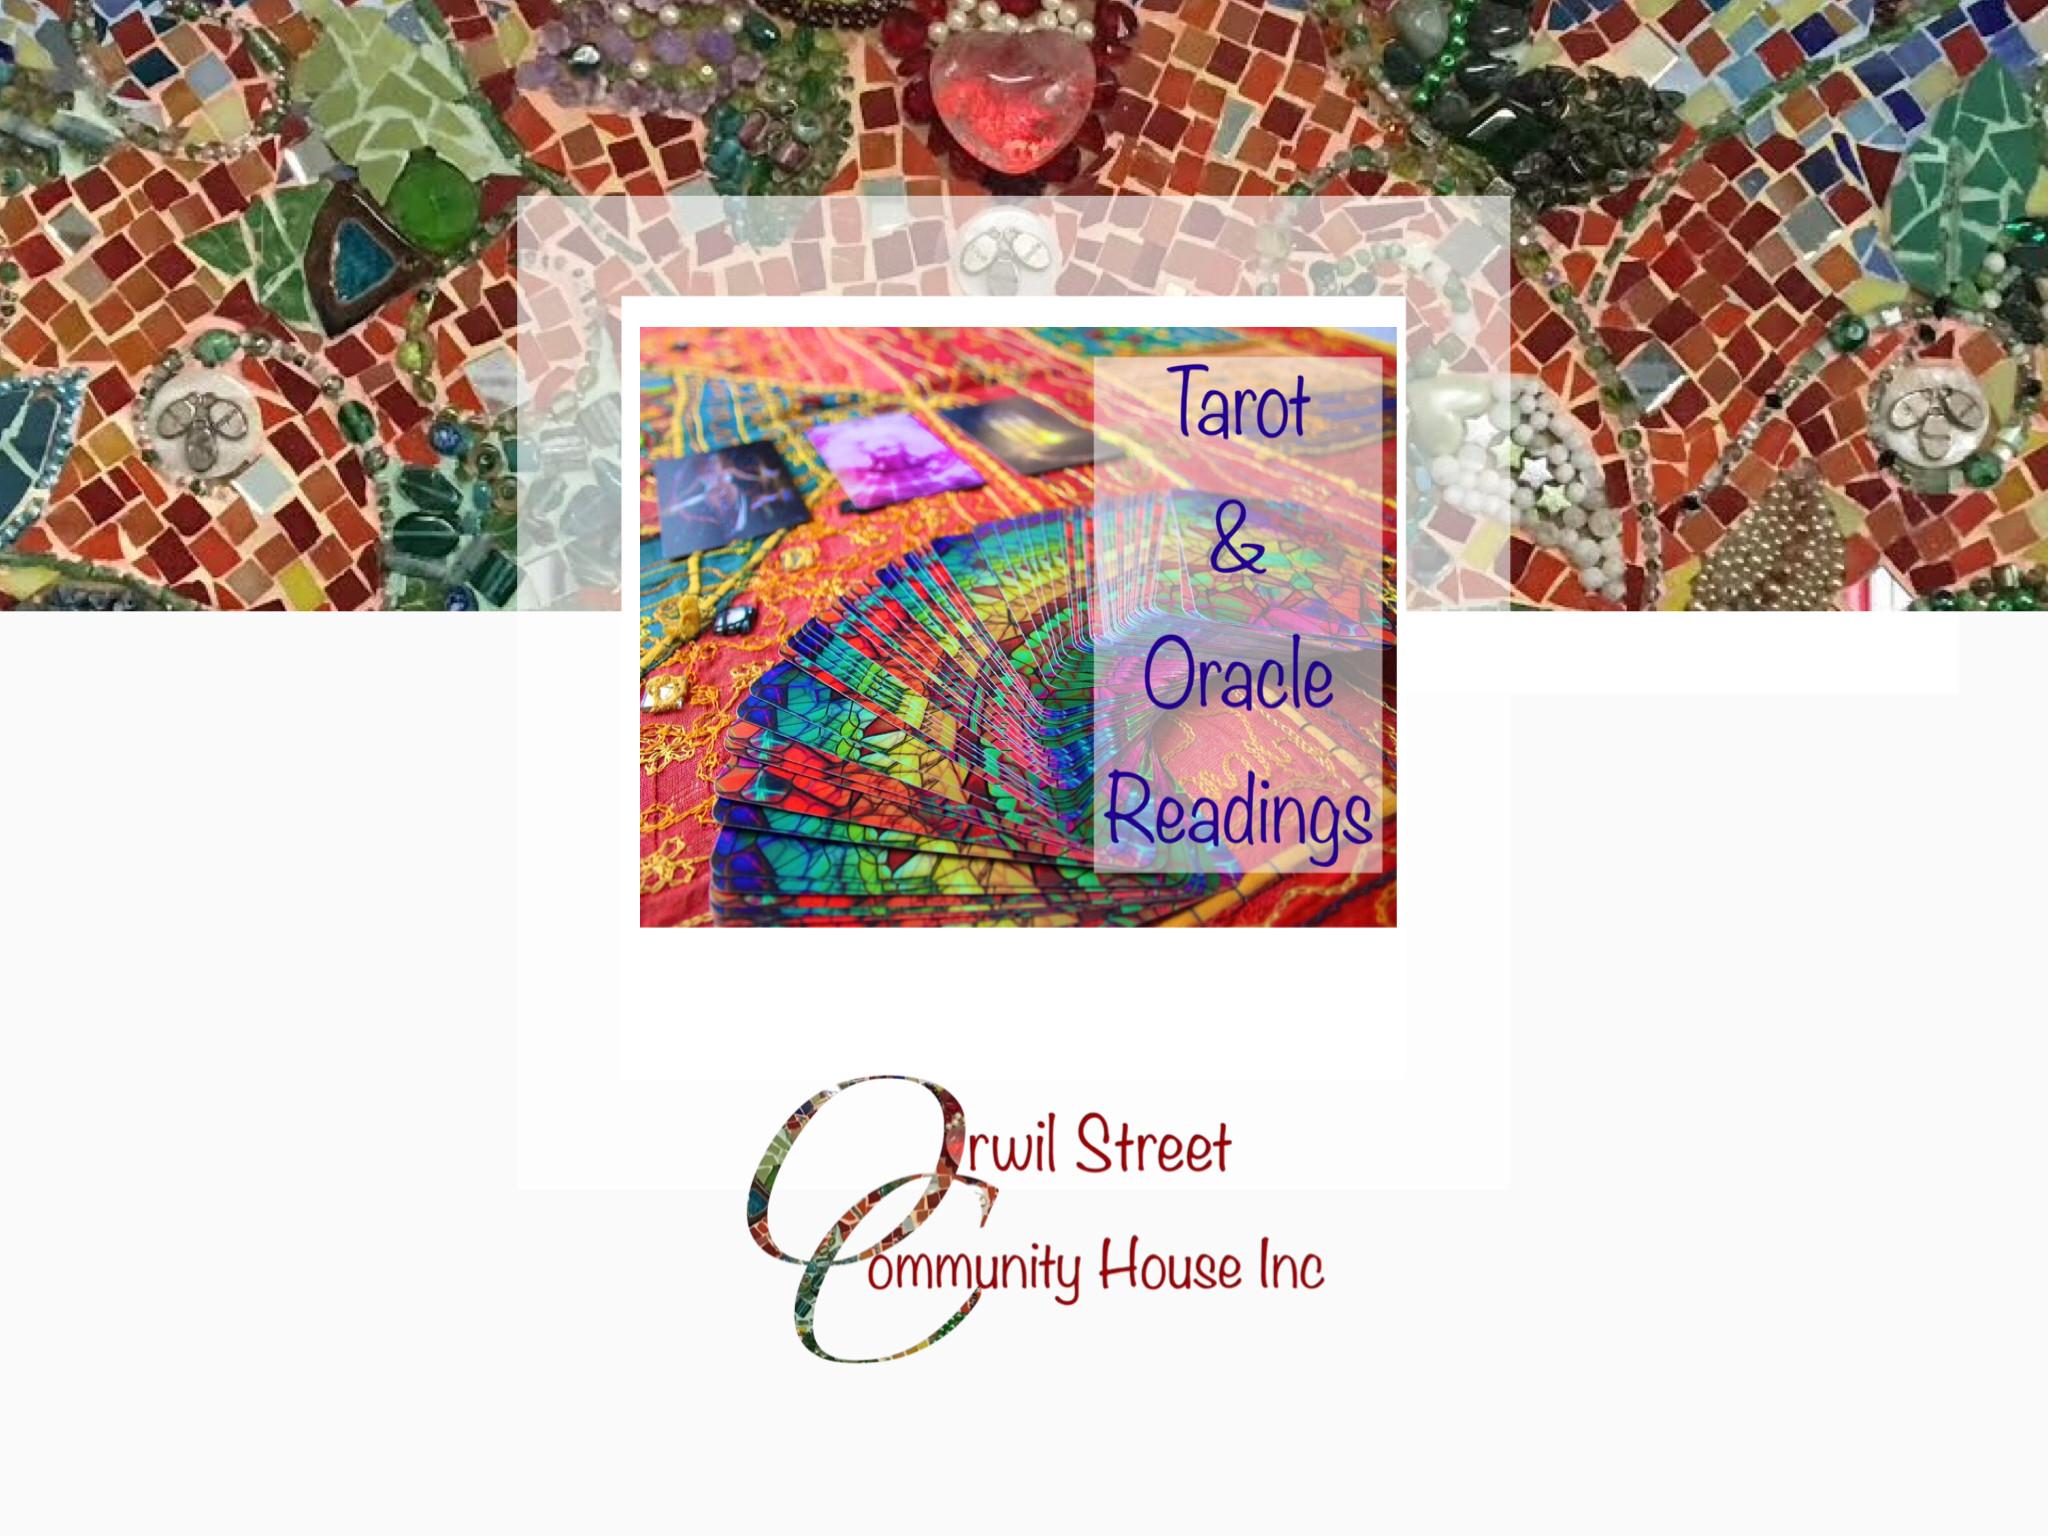 Tarot & Oracle Readings